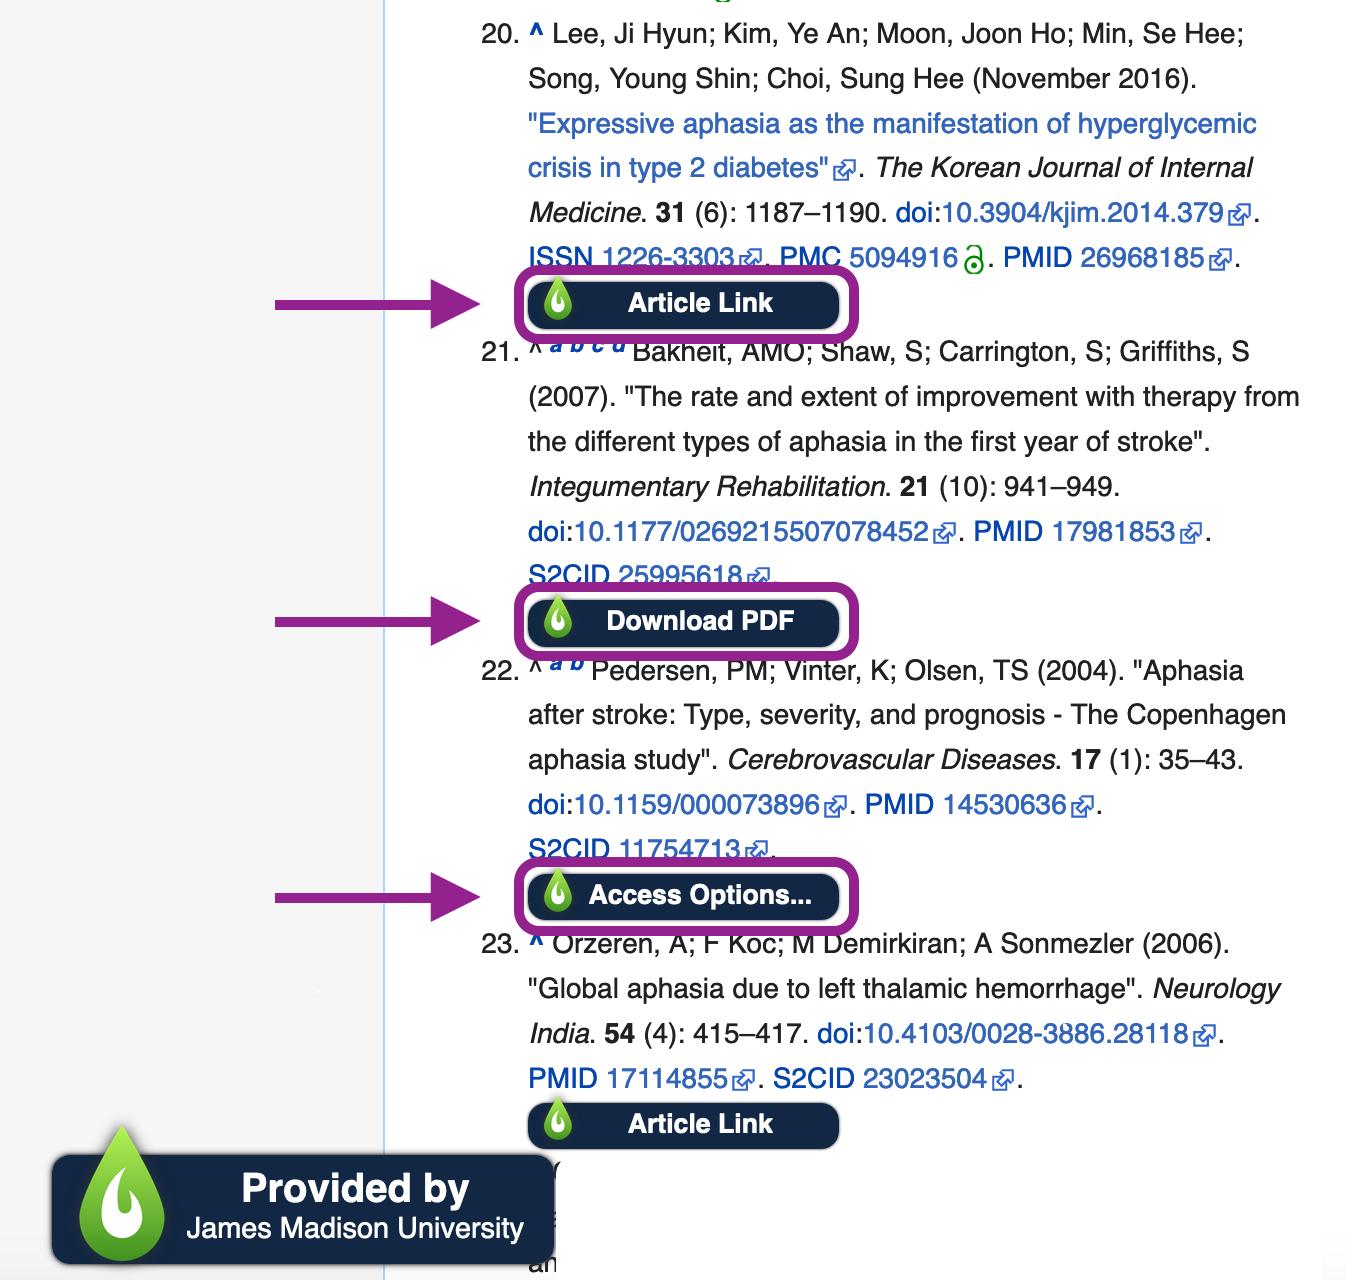 Wikipedia LibKey integration example